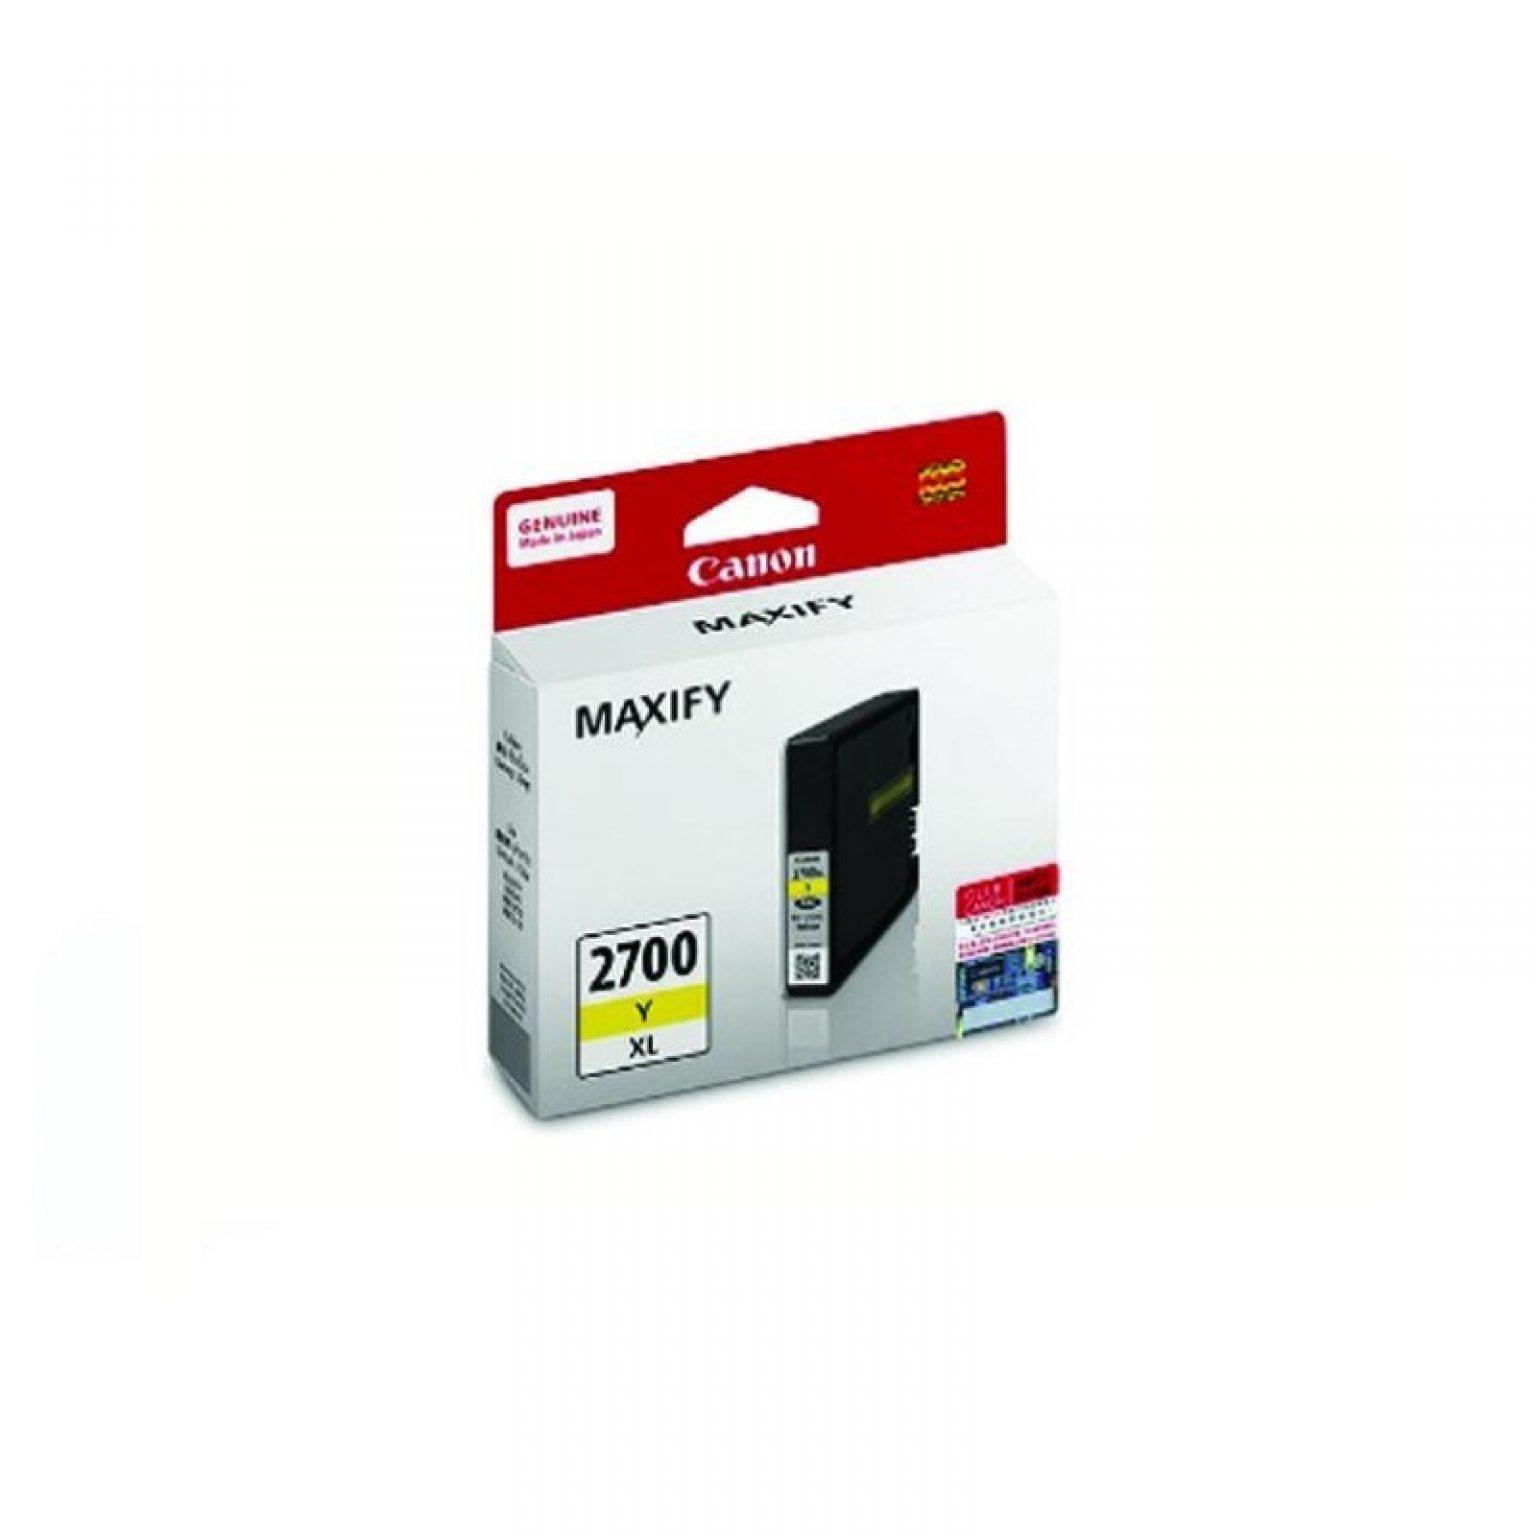 CANON - Ink Cartridge PGI-2700 Yellow XL [PGI2700Y-XL]